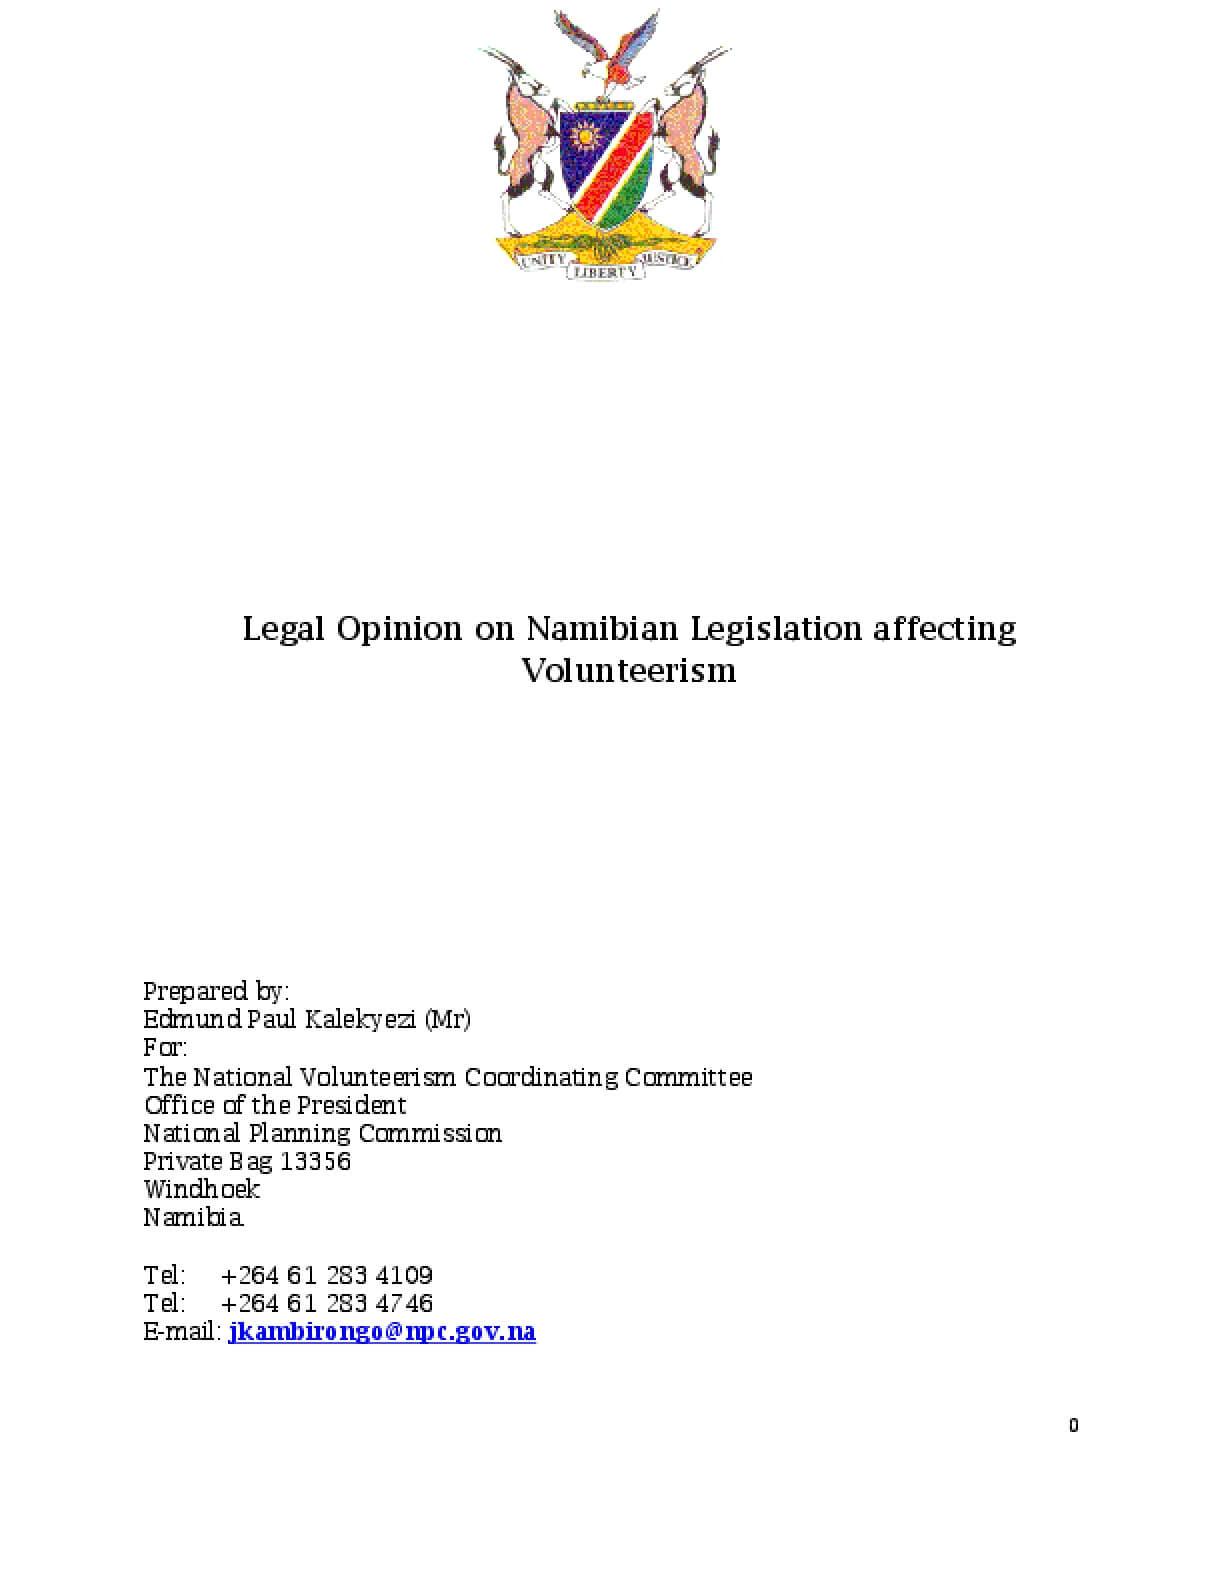 Legal Opinion on Namibian Legislation Affecting Volunteerism